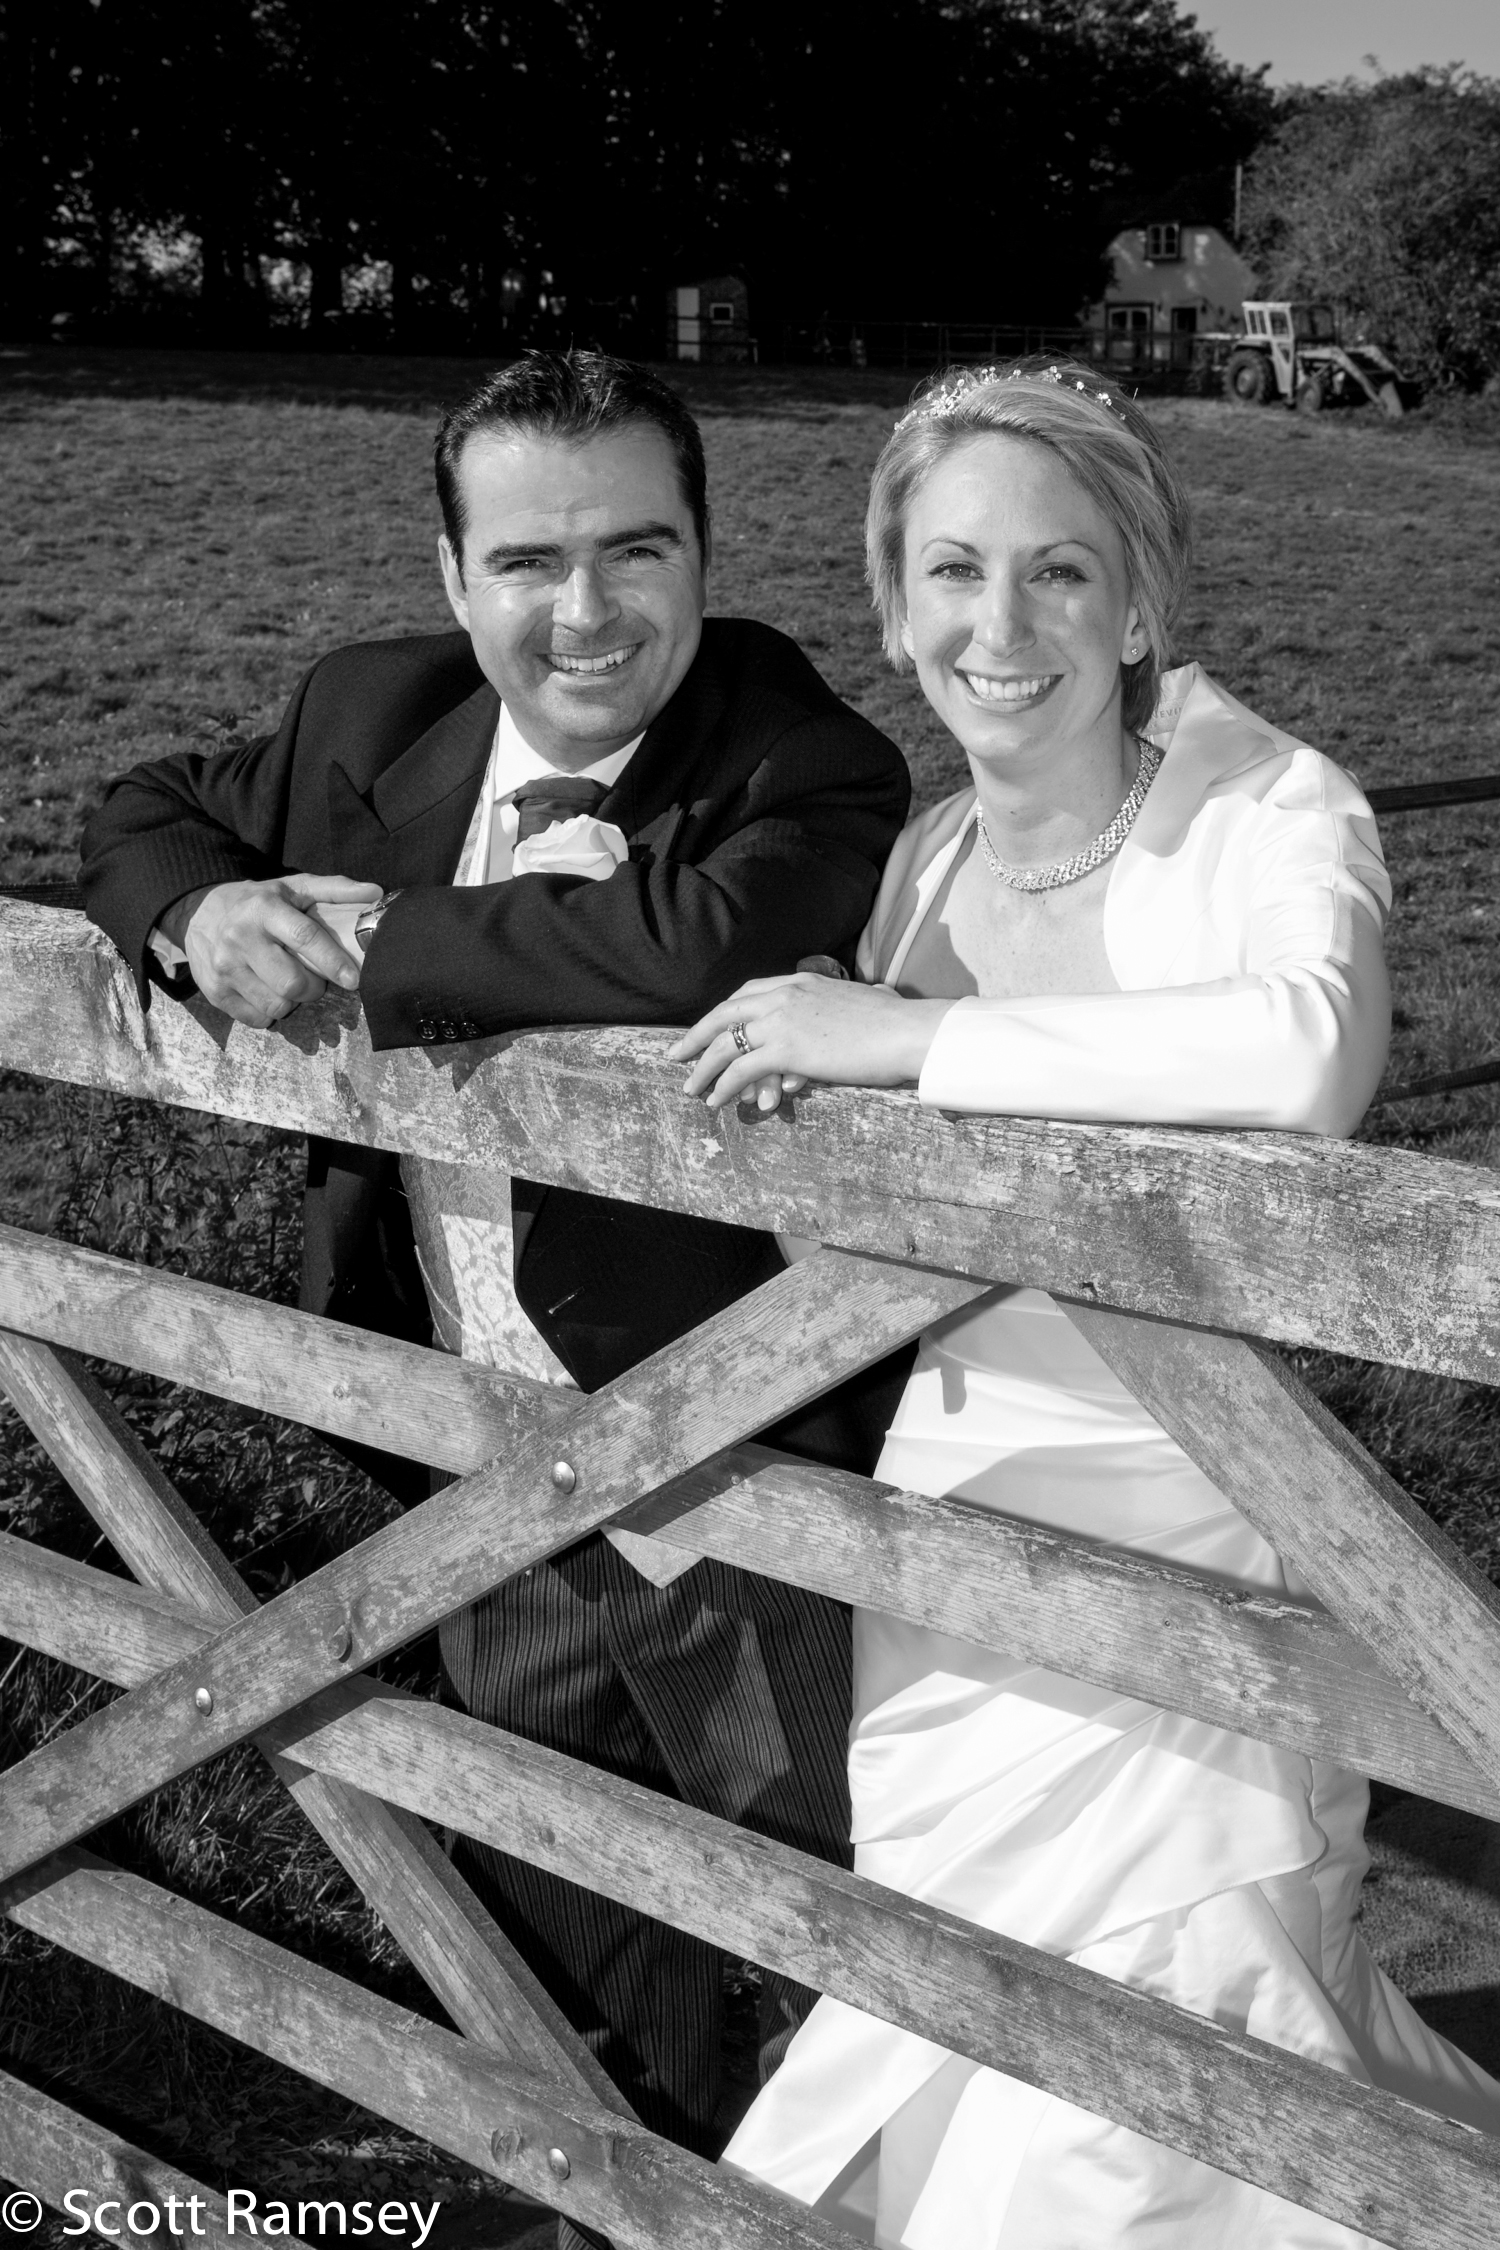 Bride And Groom Lean On Gate